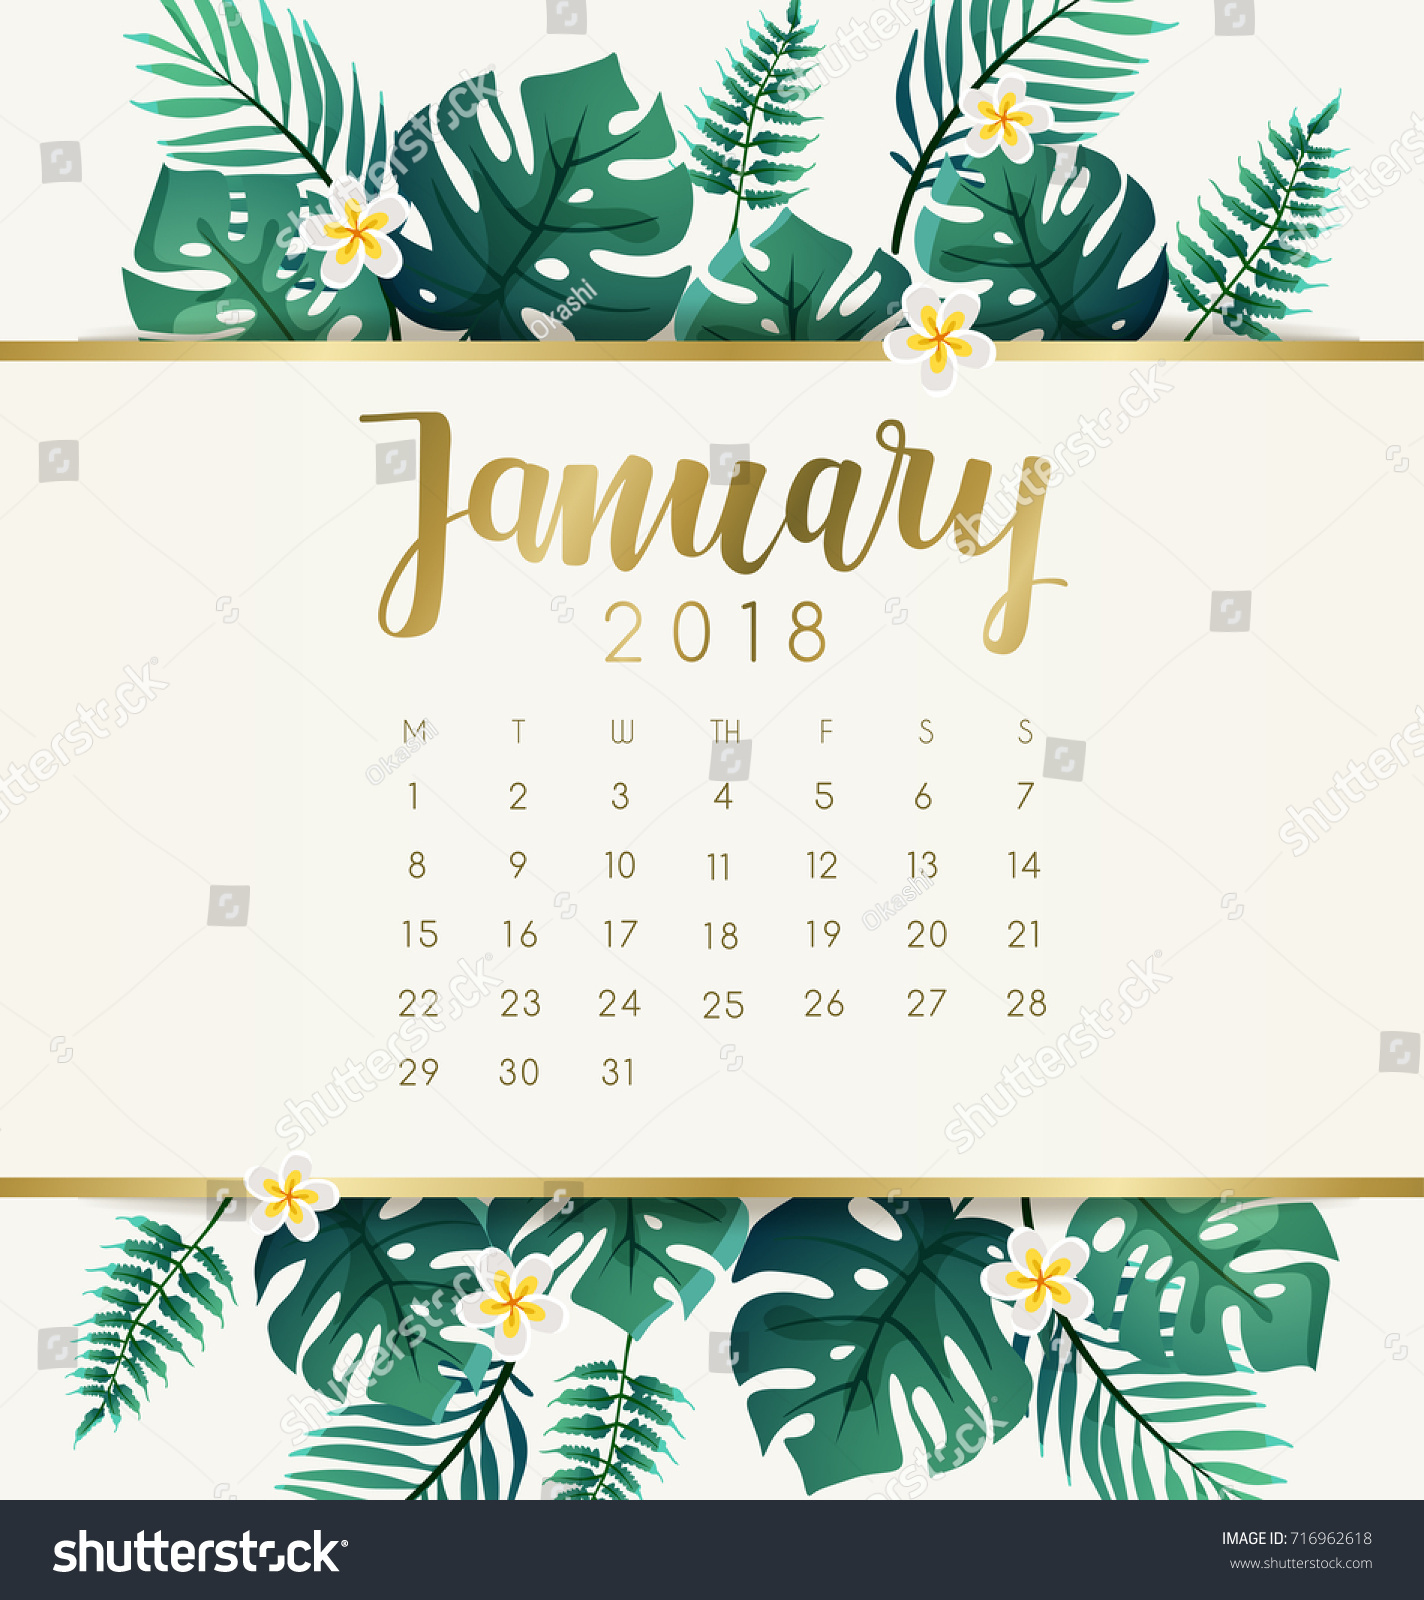 January 2018 Calendar Template Exotic Tropical Stock Vector ...